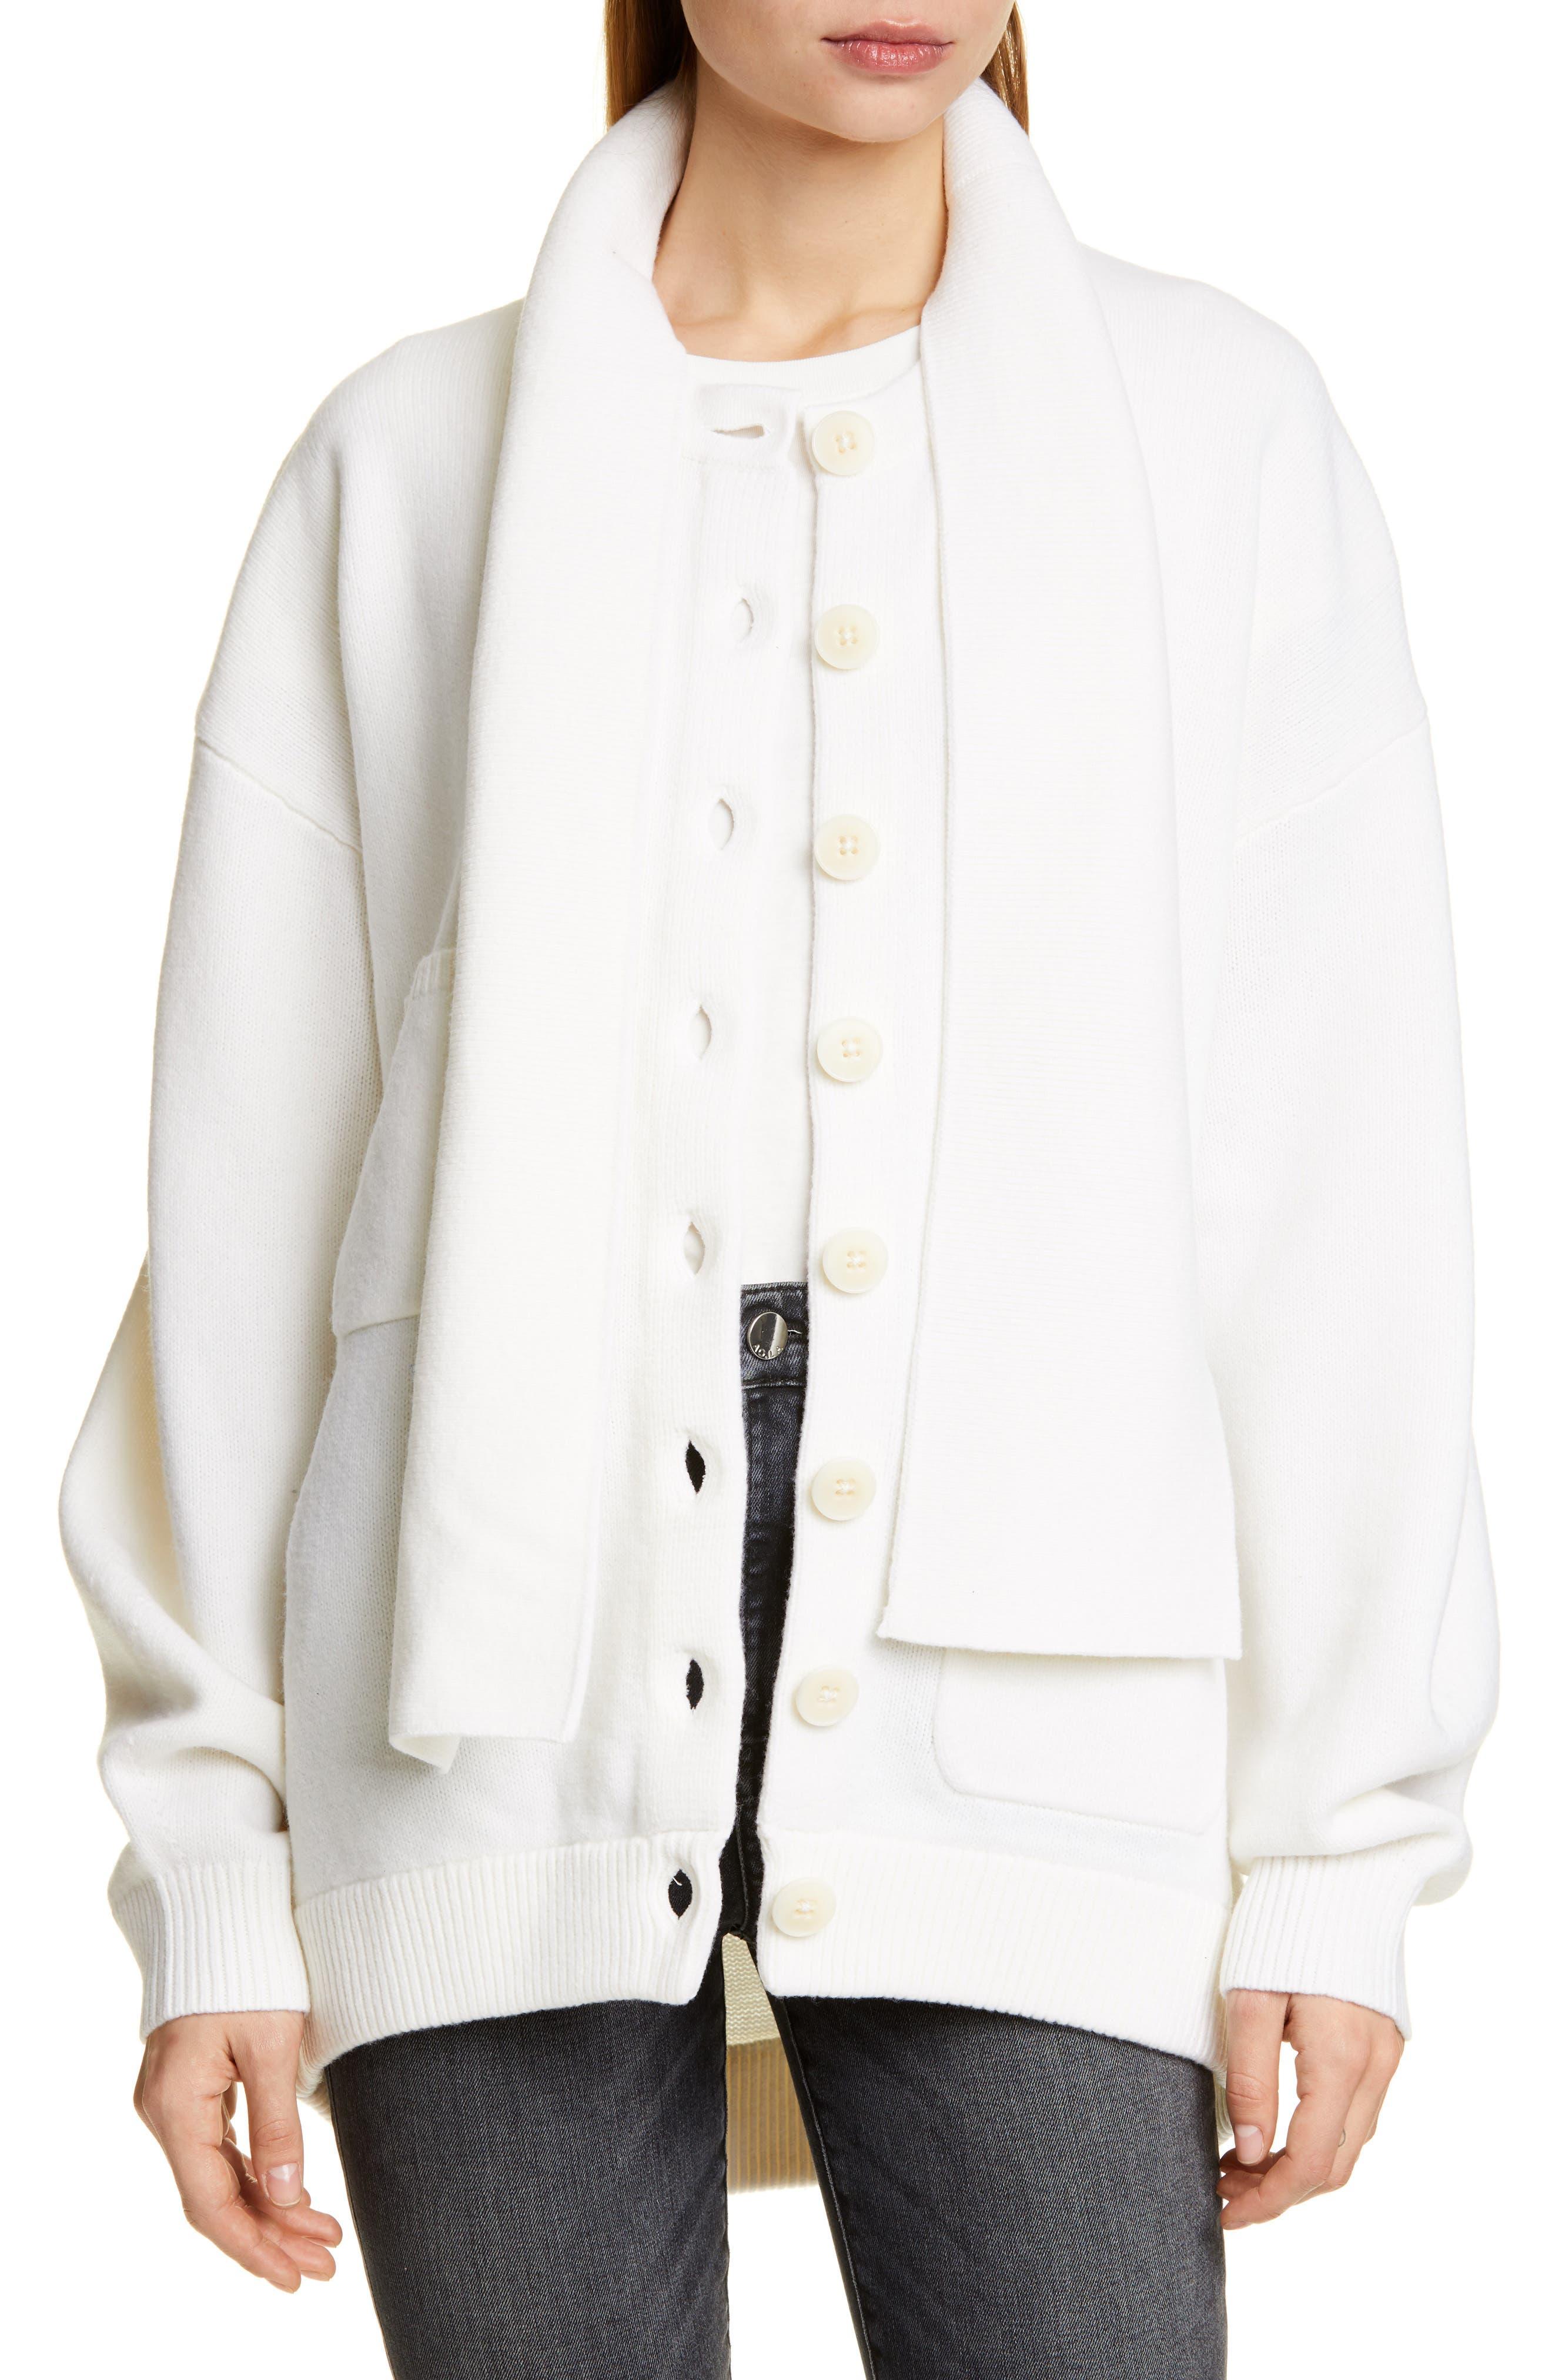 Tibi Tie Neck Merino Wool Blend Cardigan, Ivory